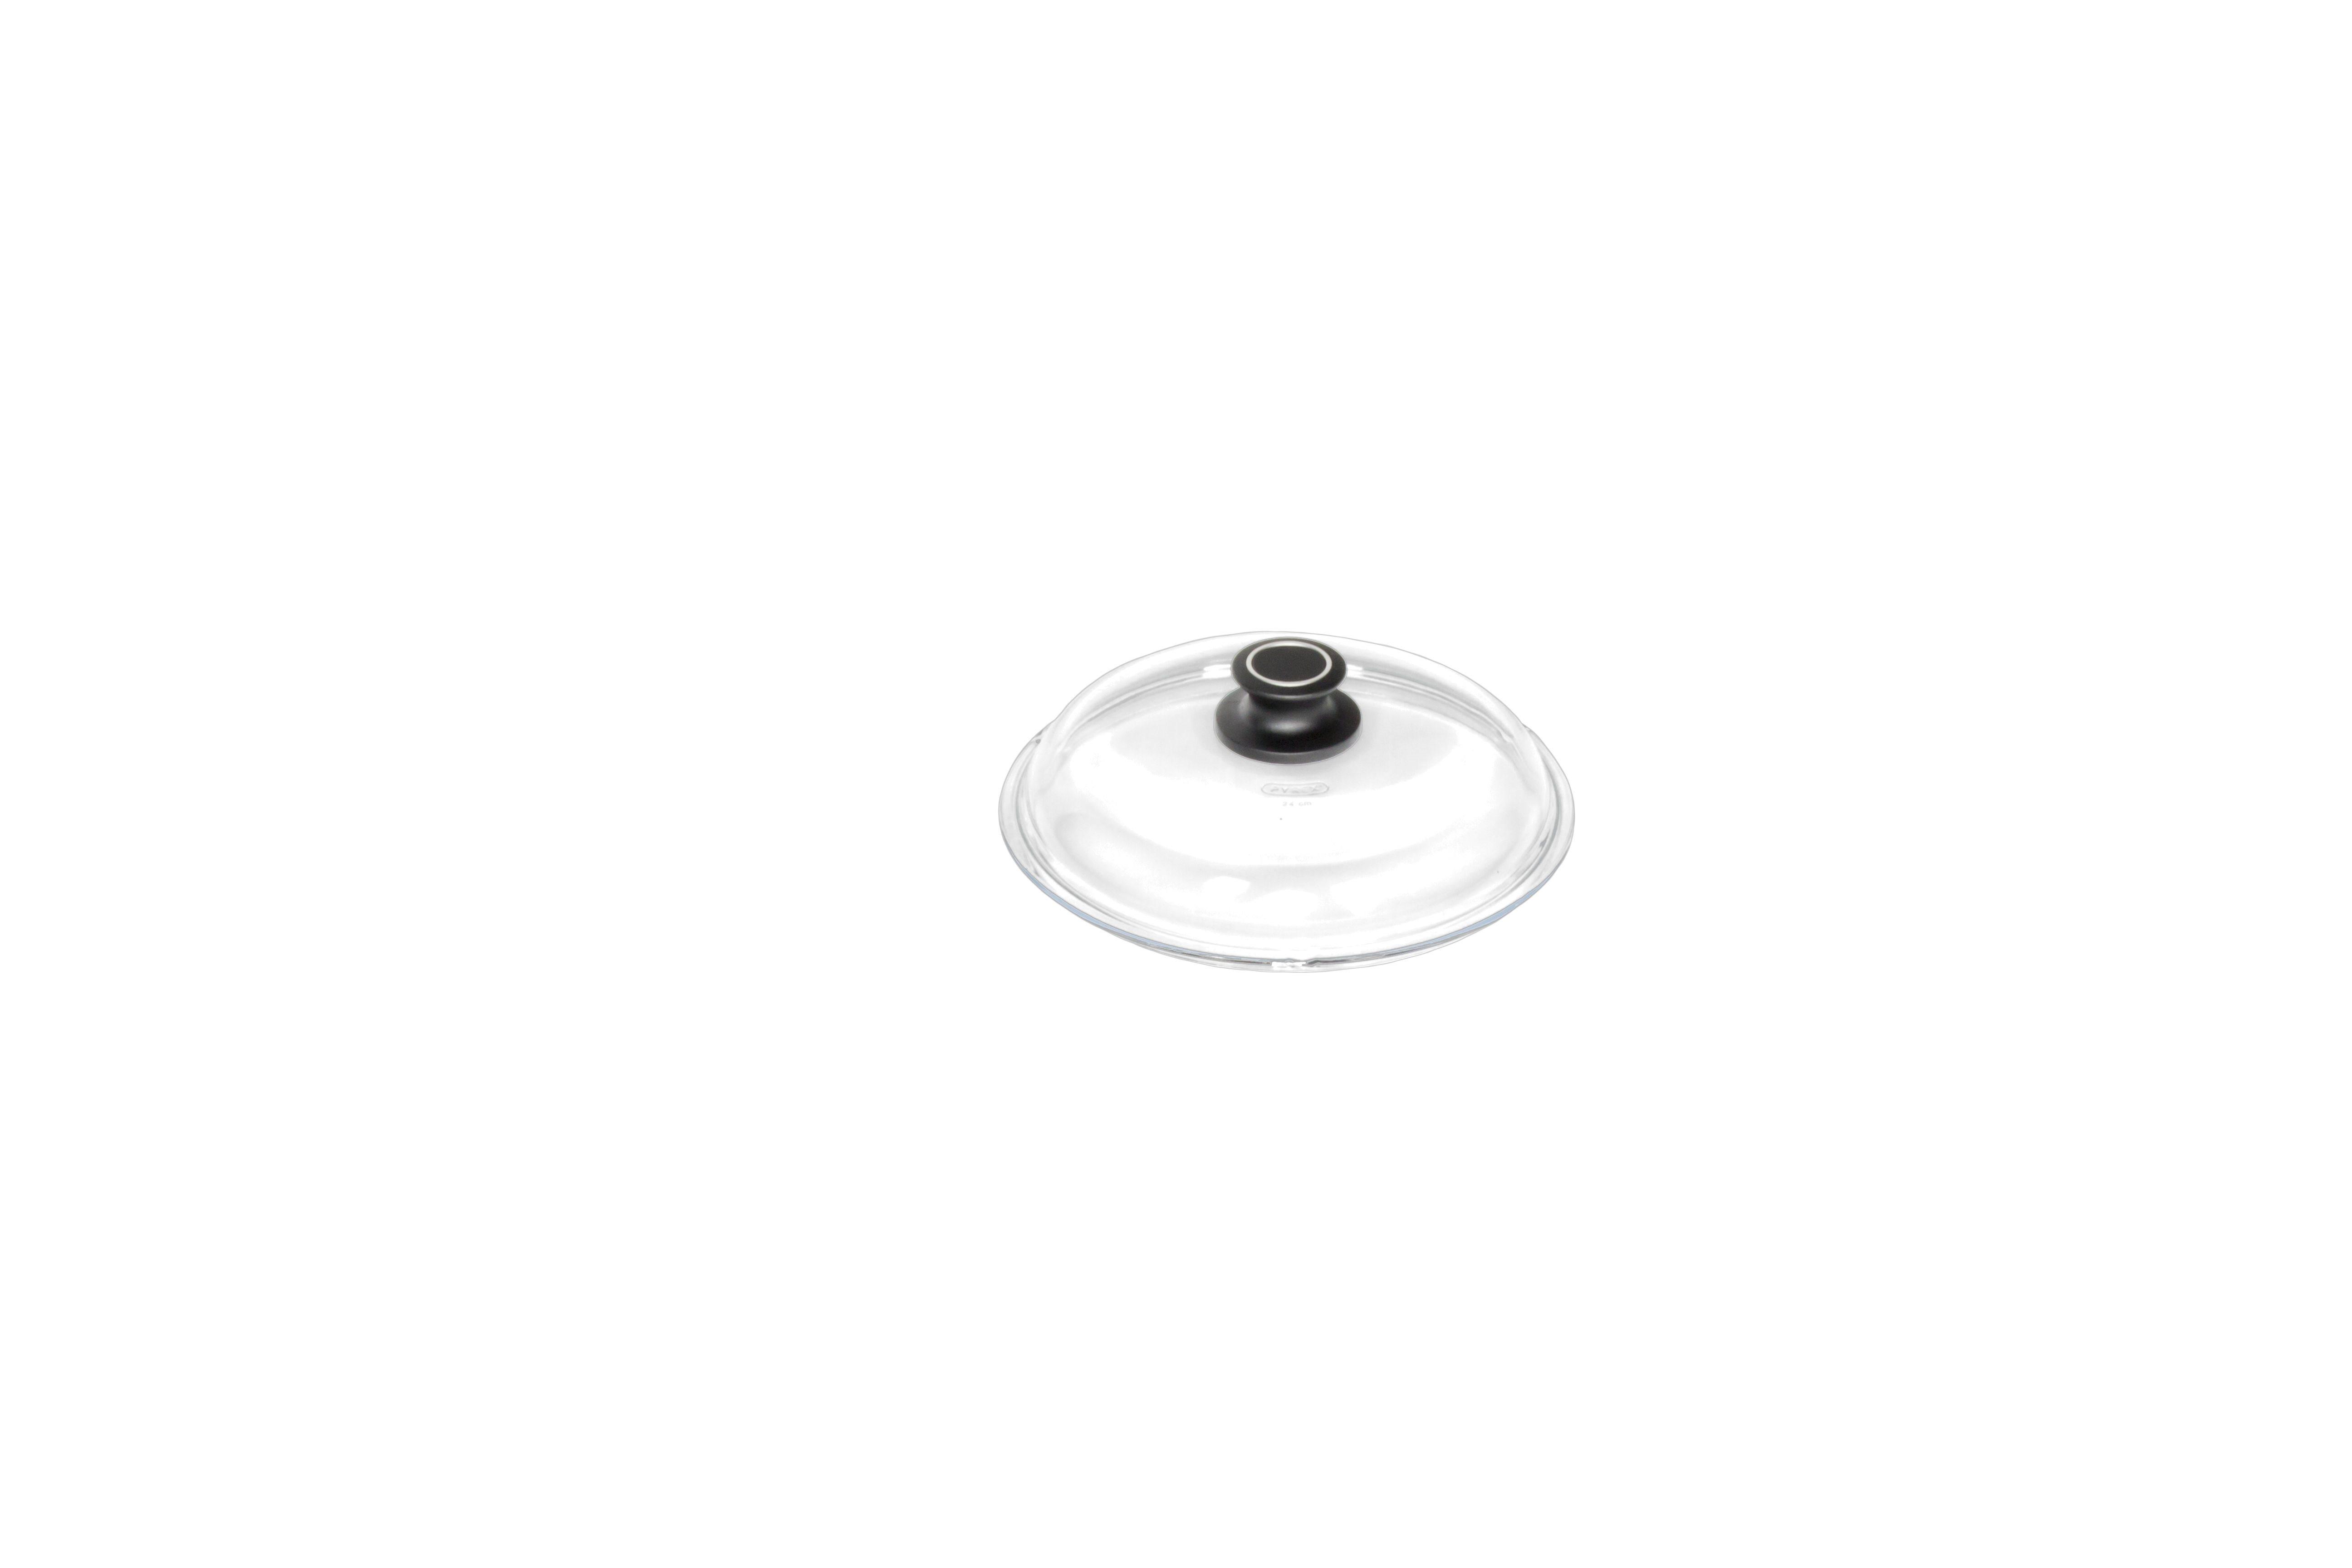 AMT WORLD S BEST PAN Καπάκι Γυάλινο 24cm  - 024-E